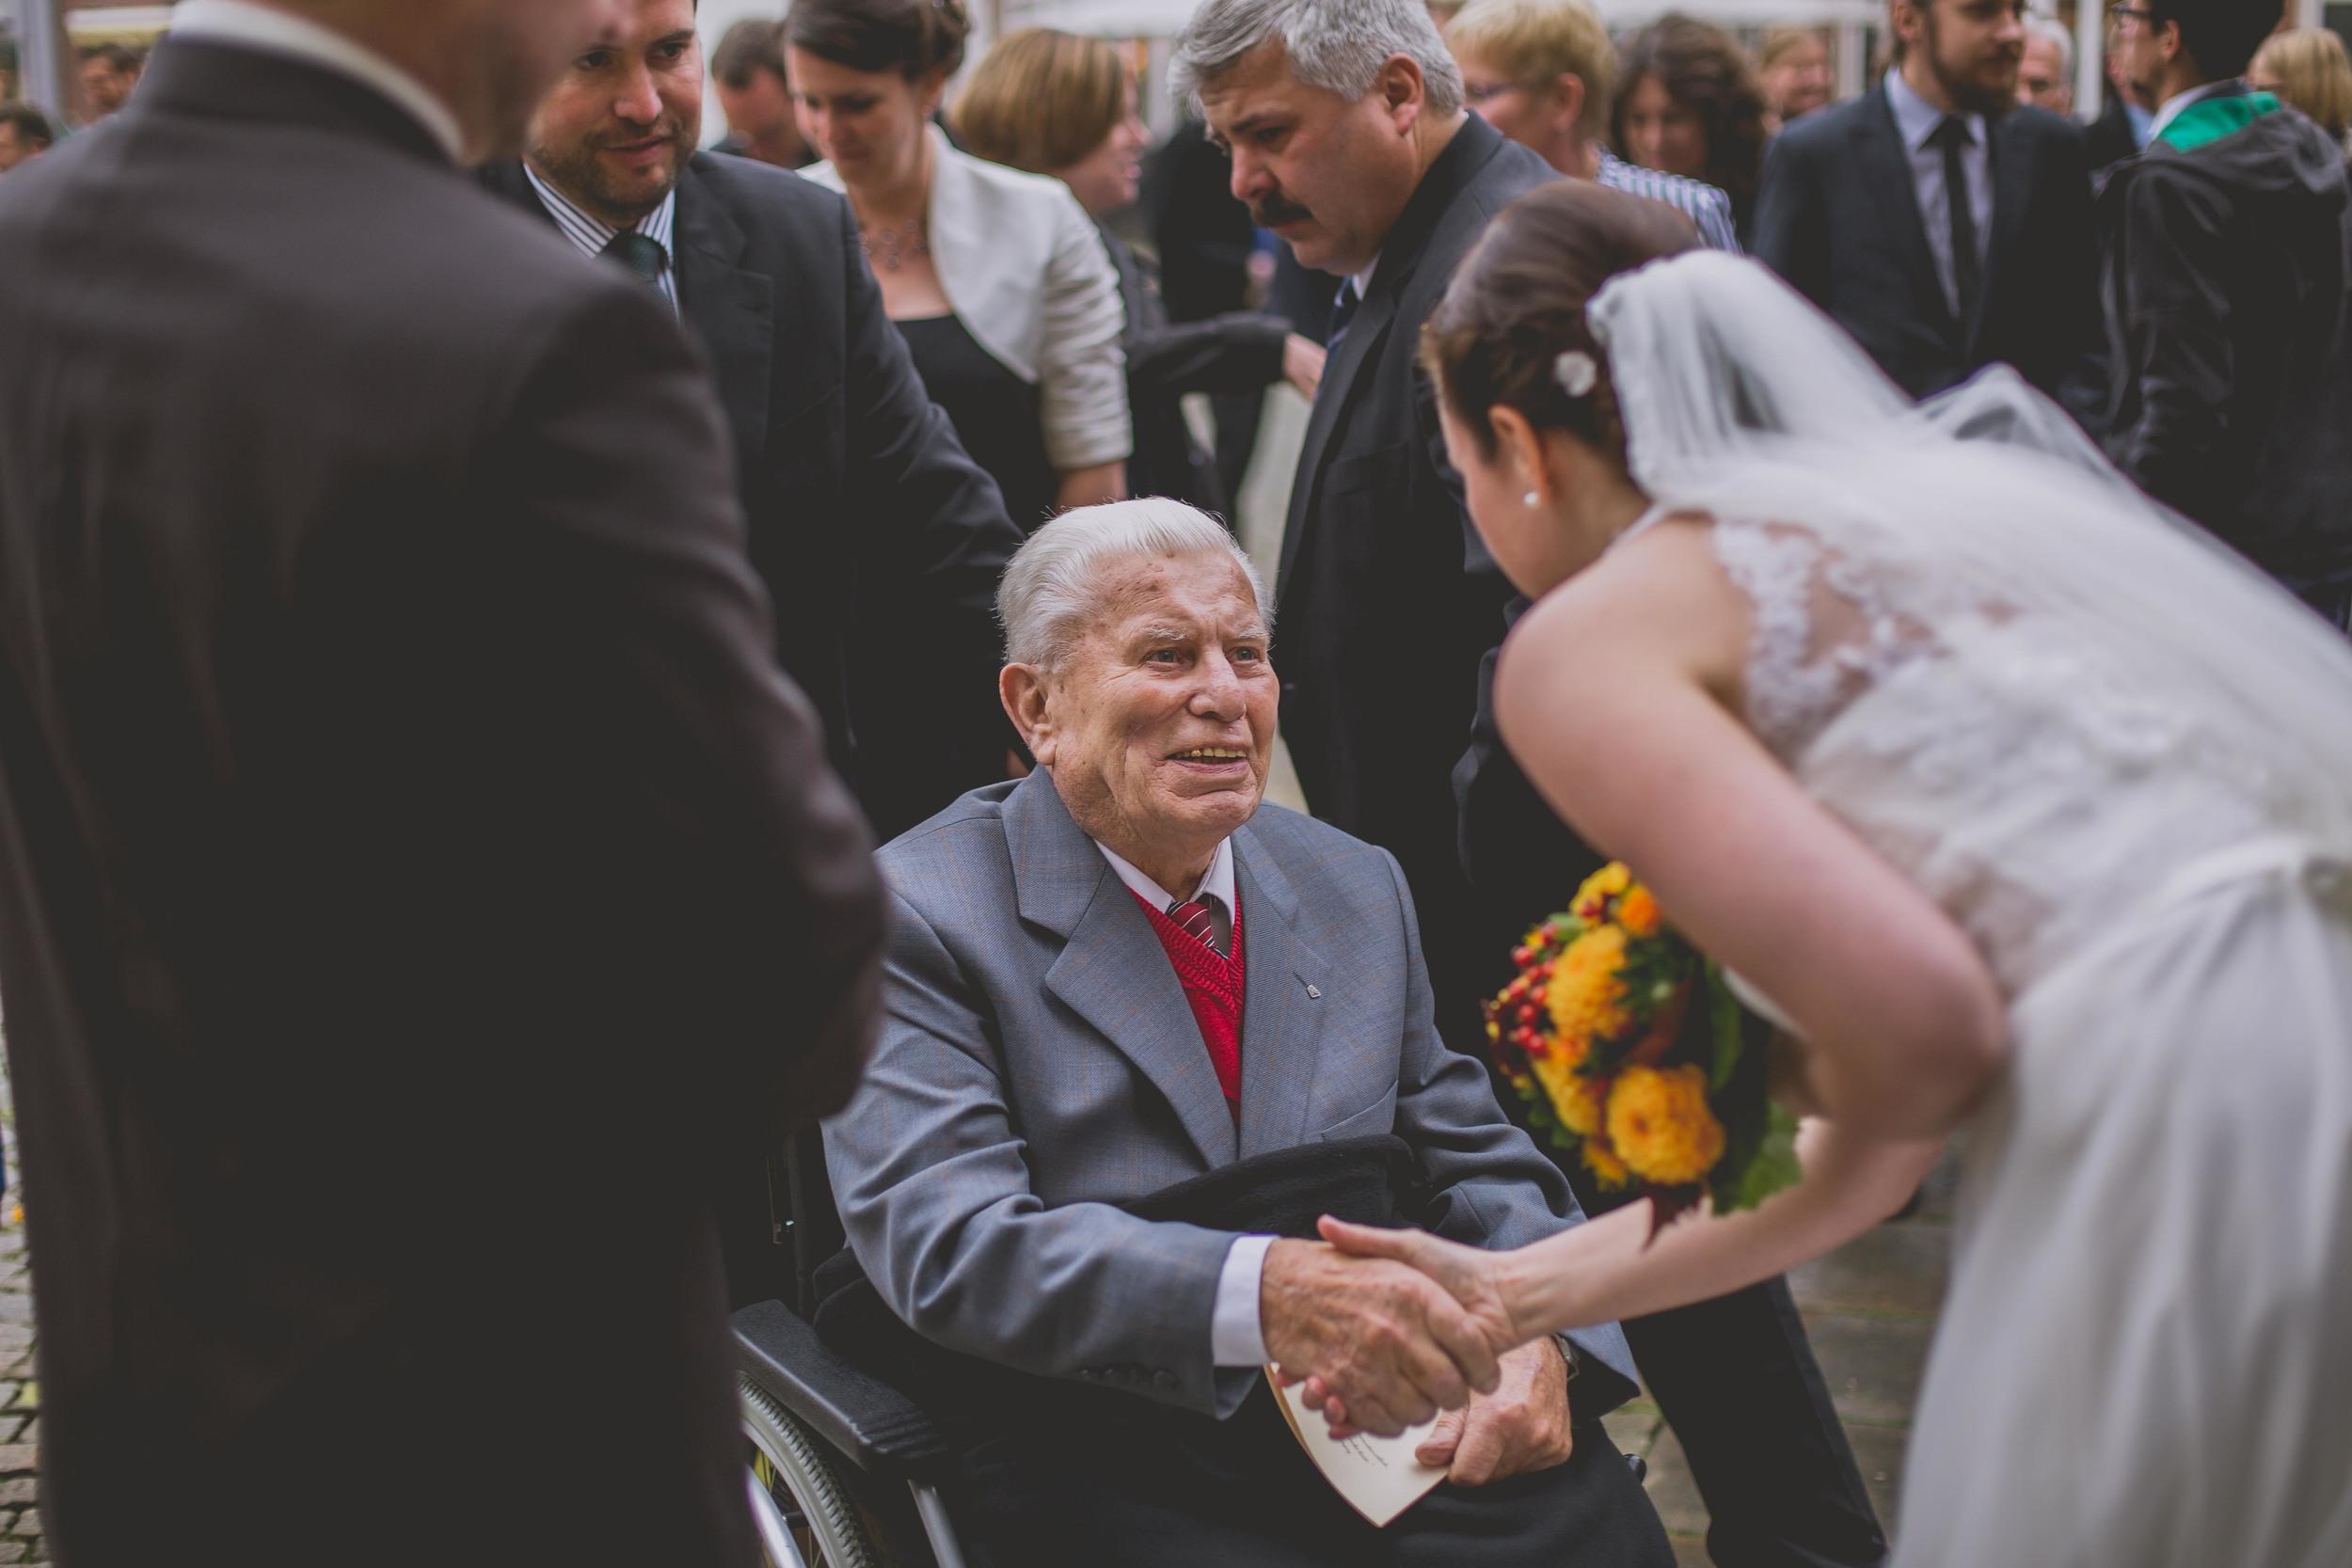 Buffalo-Wedding-Photography-by-Stefan-Ludwig10252014WEB-56.jpg